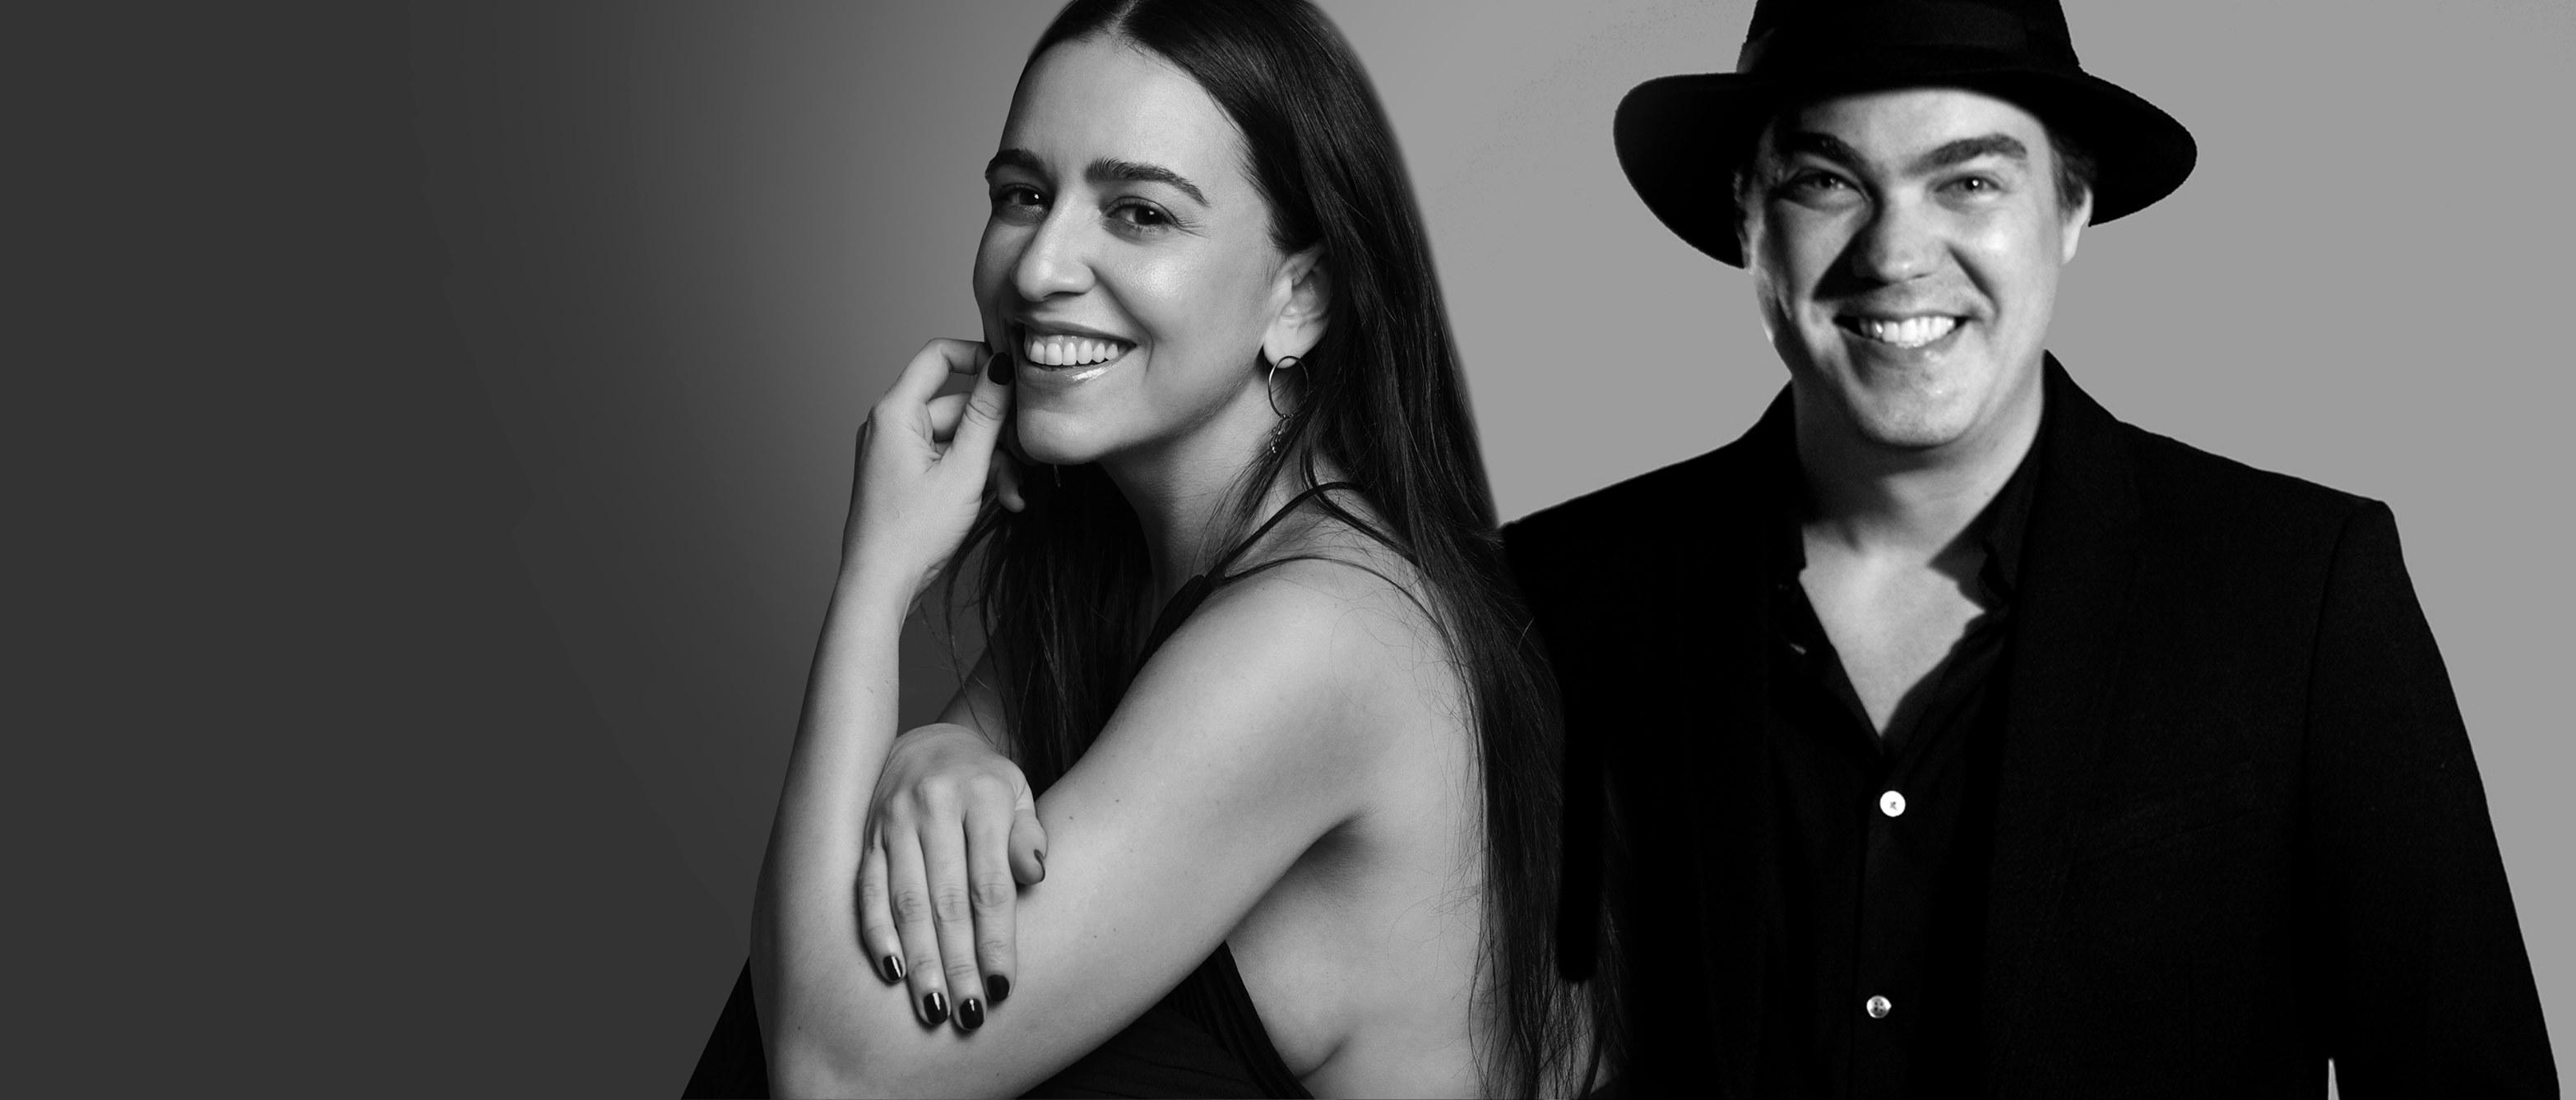 ESTARREJAZZ 2021: ROBERTA SÁ & DANIEL JOBIM 'CHEGA DE SAUDADE'